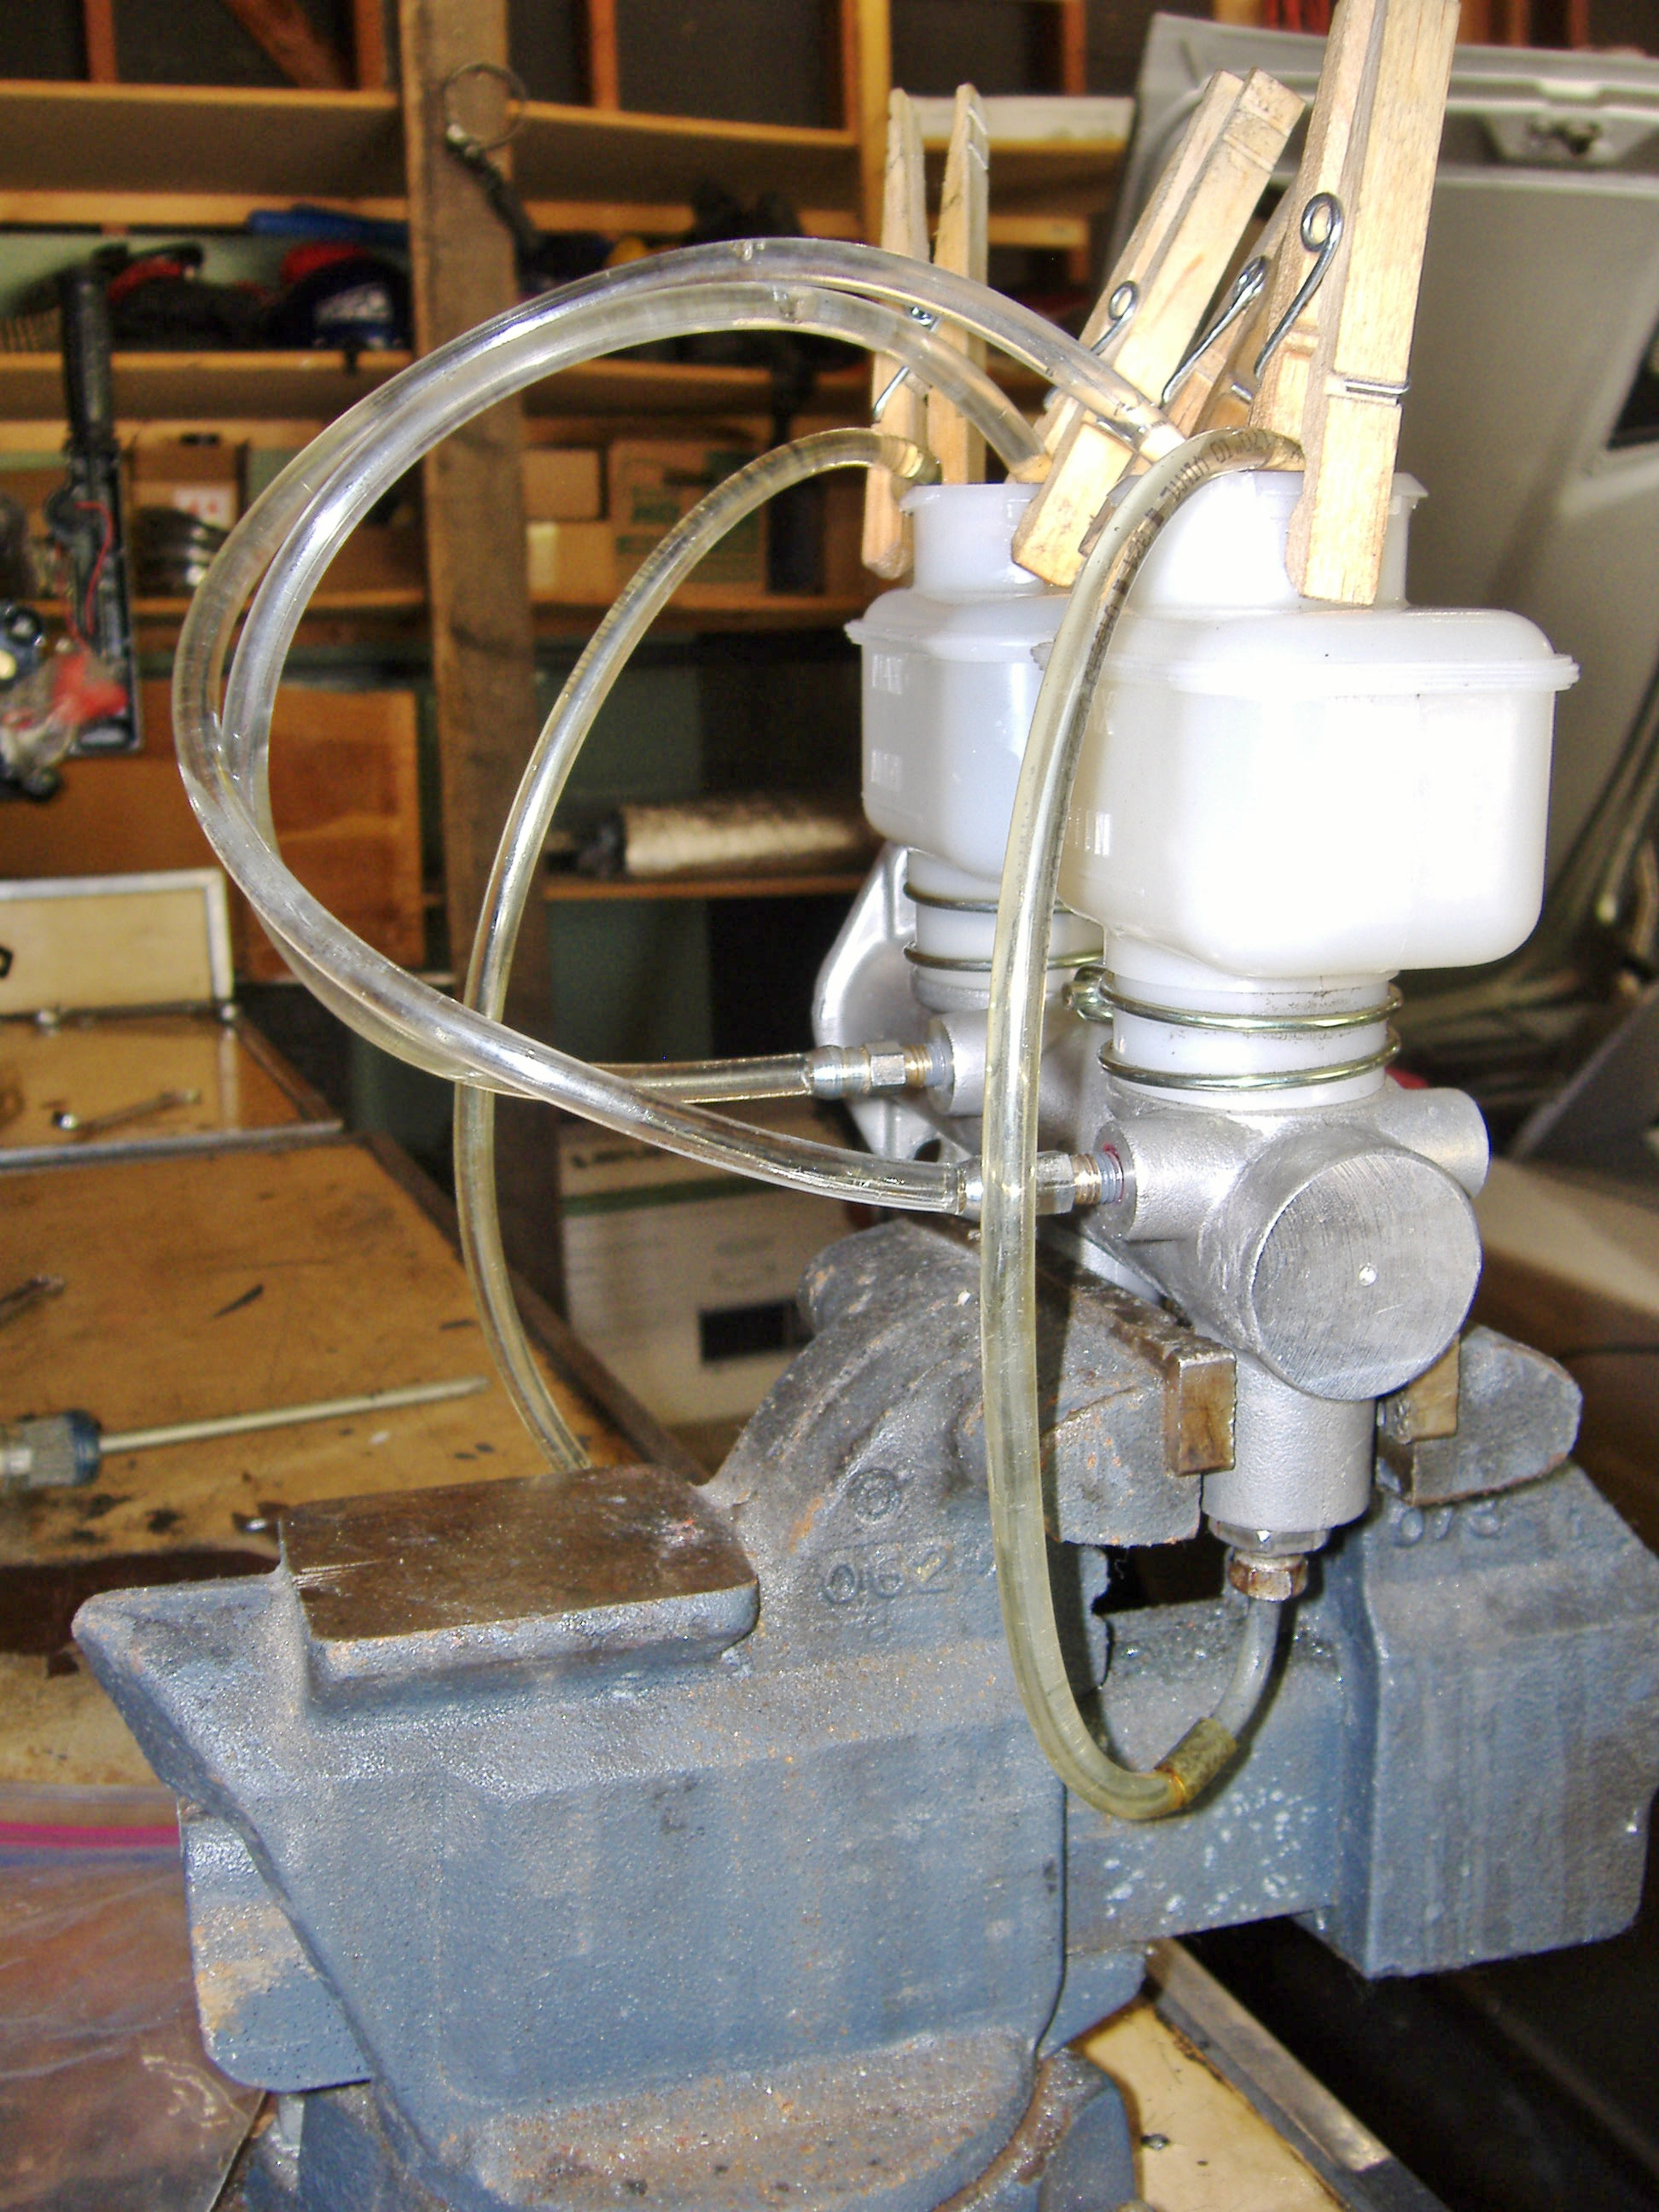 Stupendous Master Cylinder Bench Bleeding Brakes Wheels Suspension Pdpeps Interior Chair Design Pdpepsorg